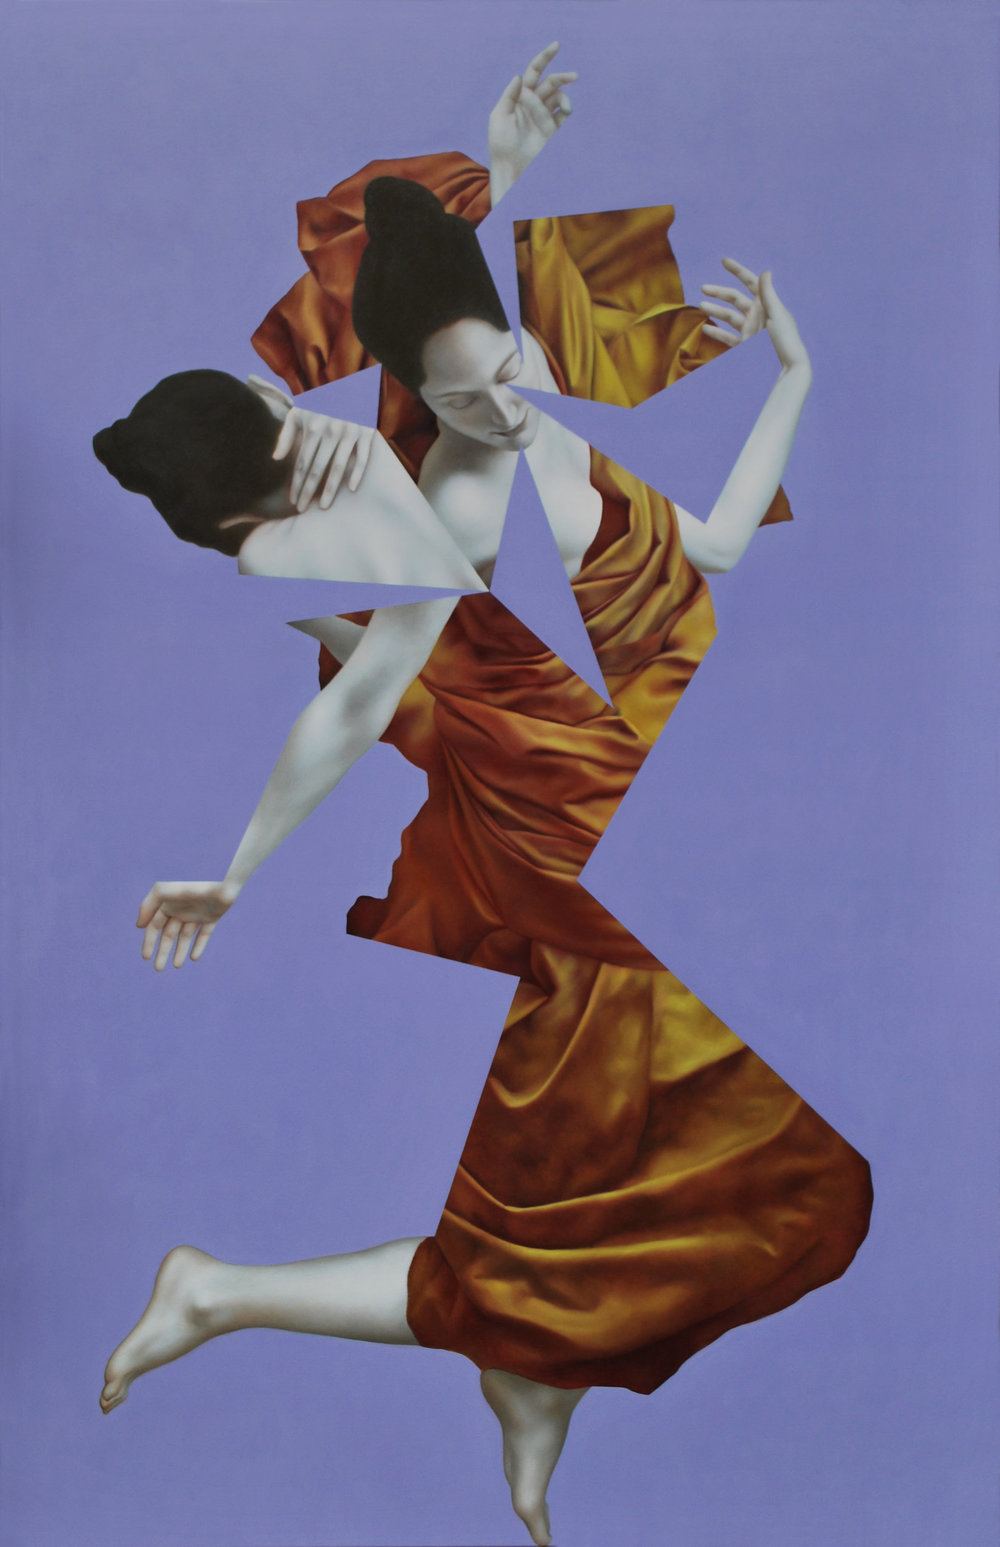 Eurydice Purple, oil on canvas, 170 x 110 cm, 2016